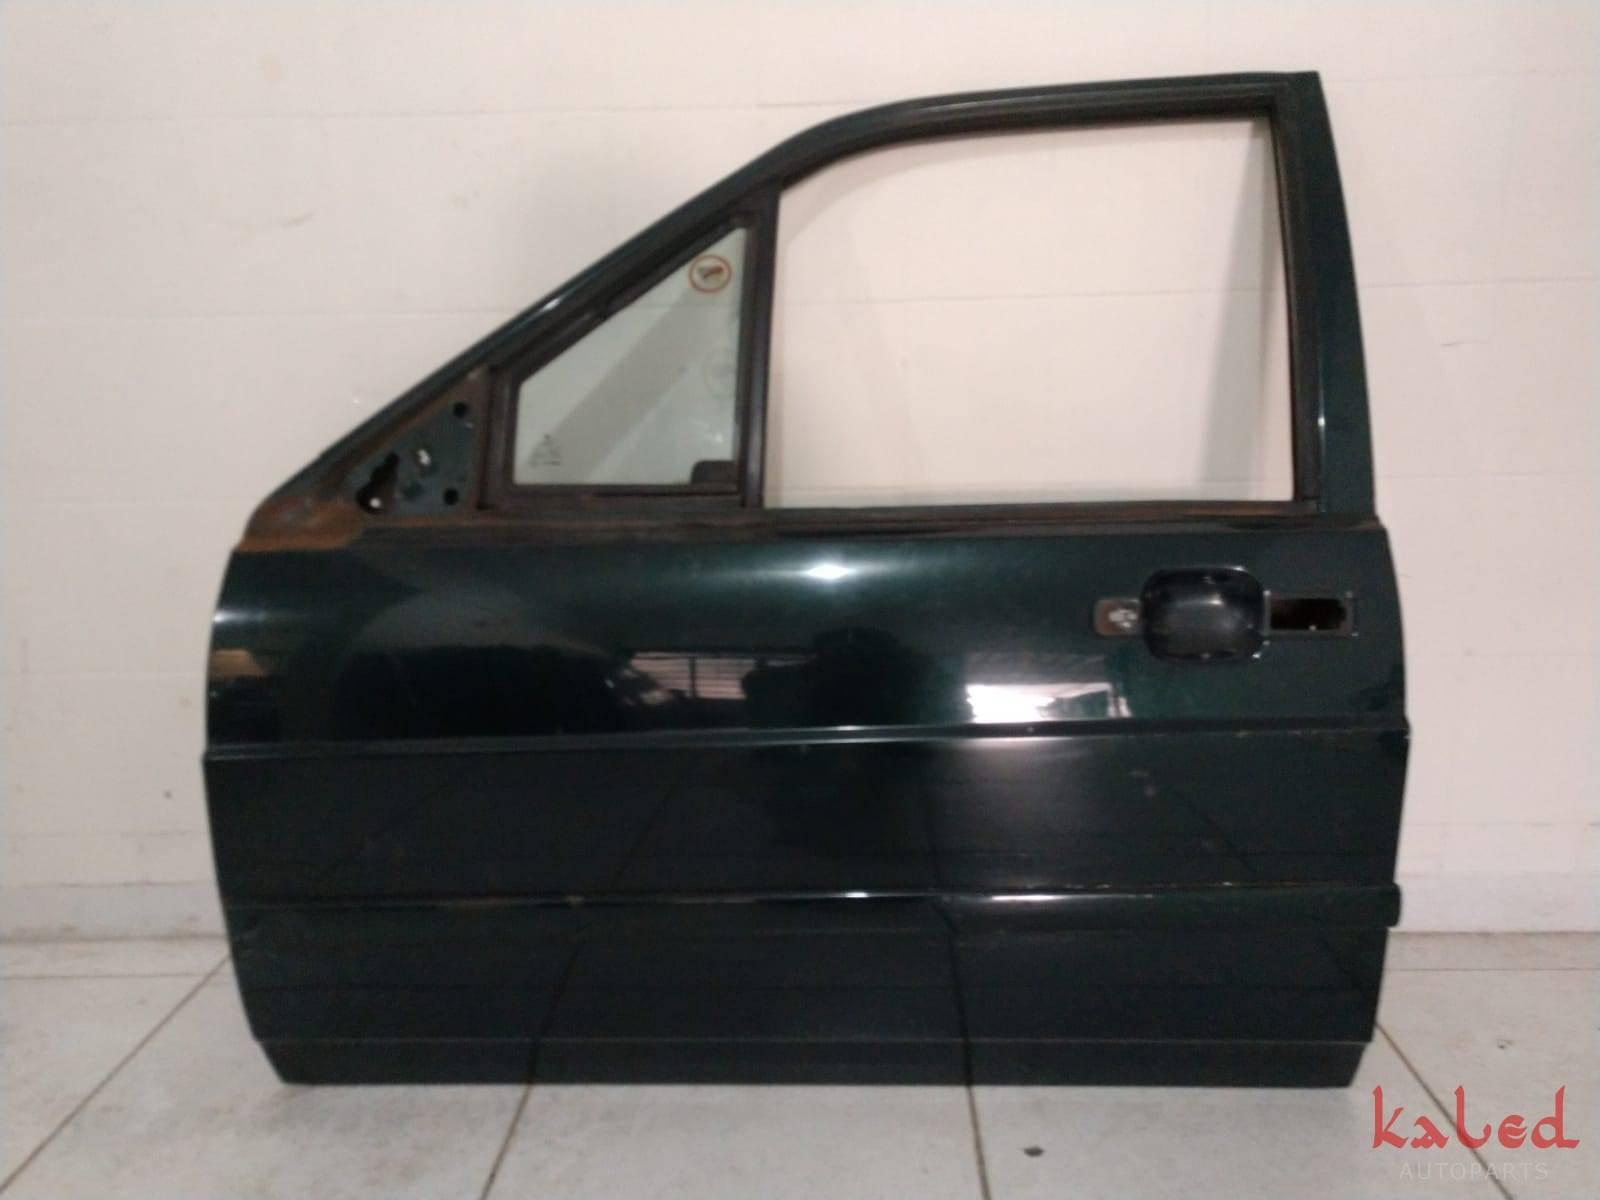 Porta motorista Santana 91 a 06 - Kaled Auto Parts